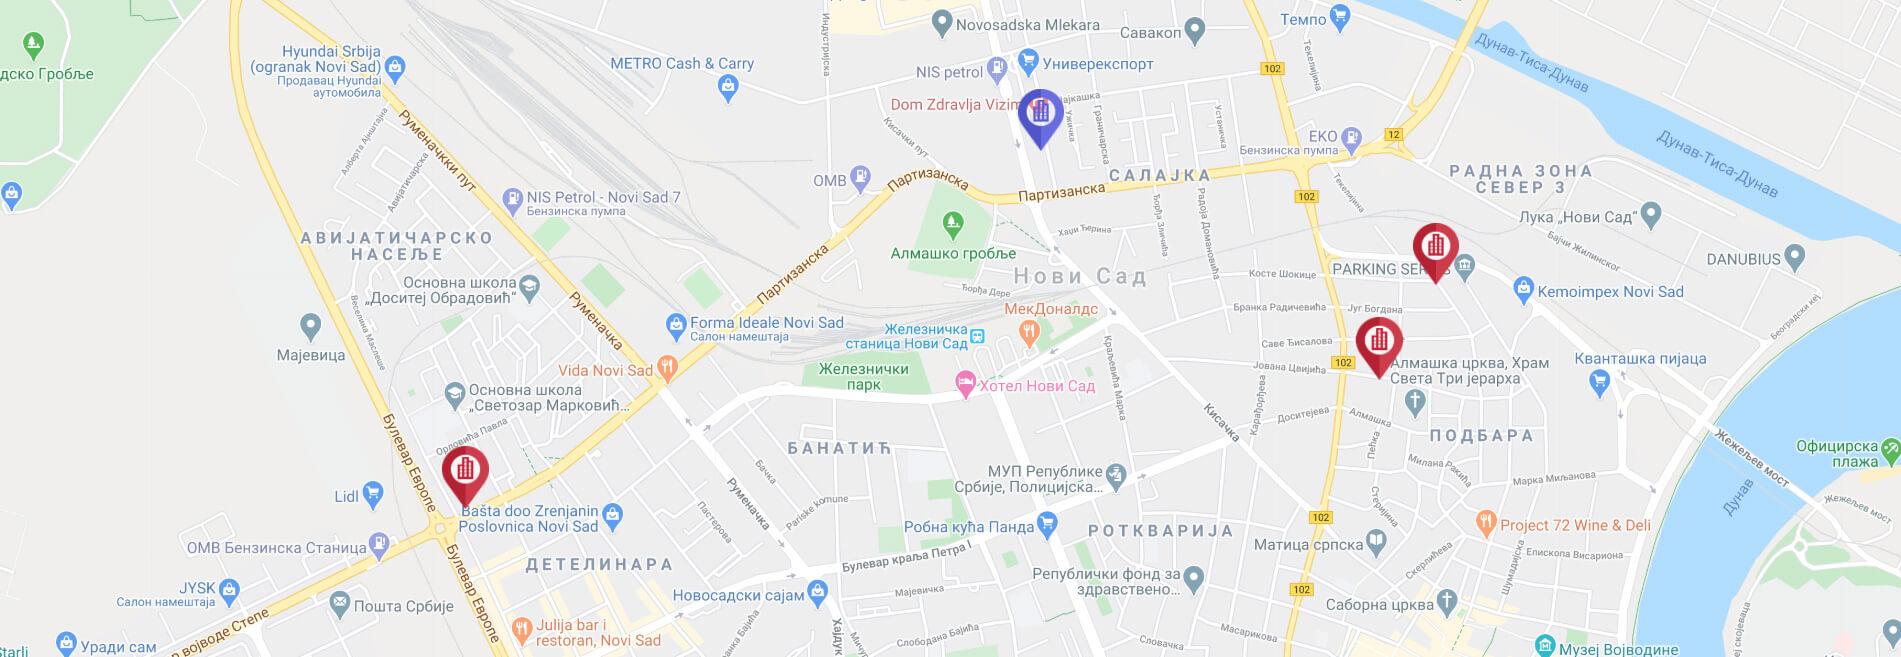 mapa-permano-opt